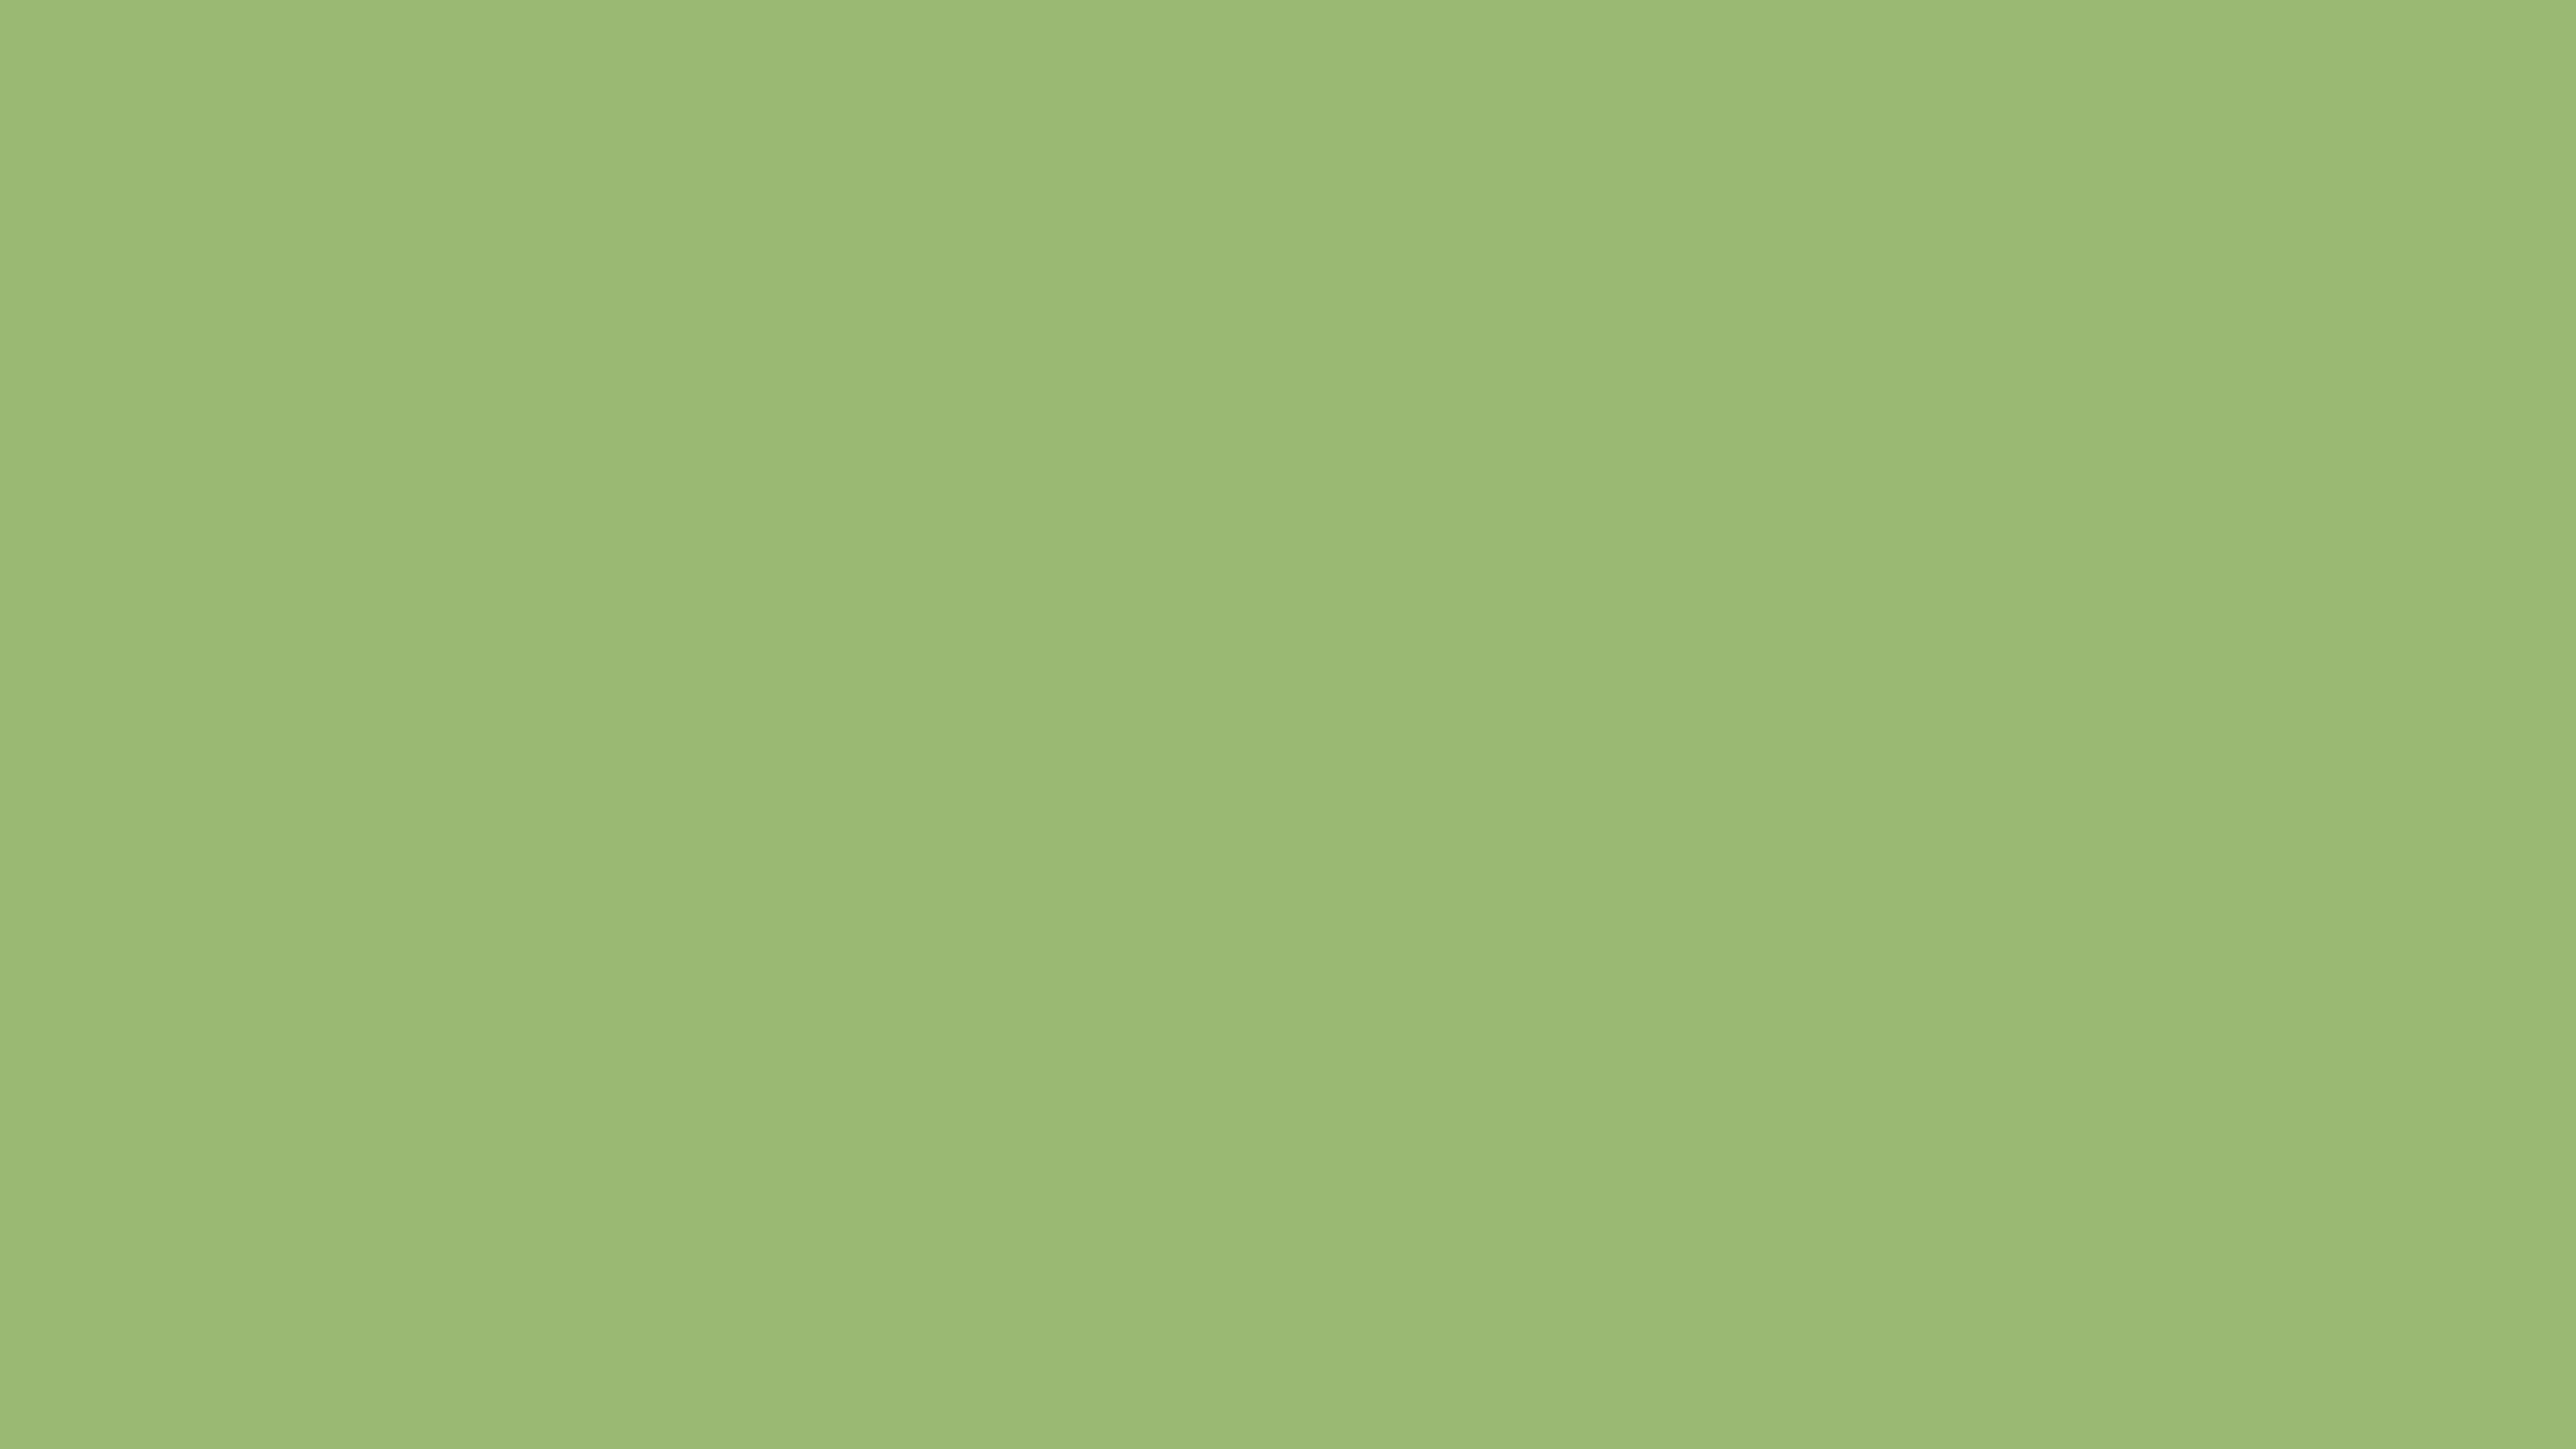 7680x4320 Olivine Solid Color Background